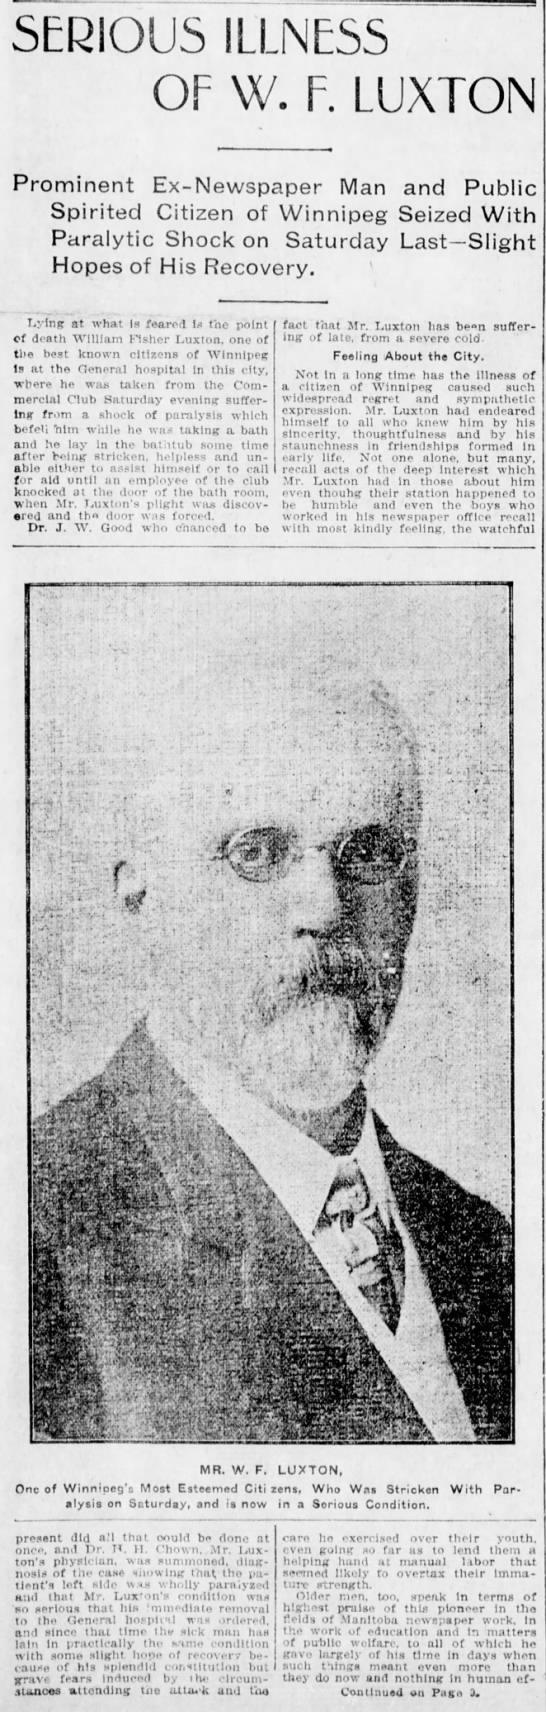 W F Luxton Serious Illness 20 May 1907 Pg. 1